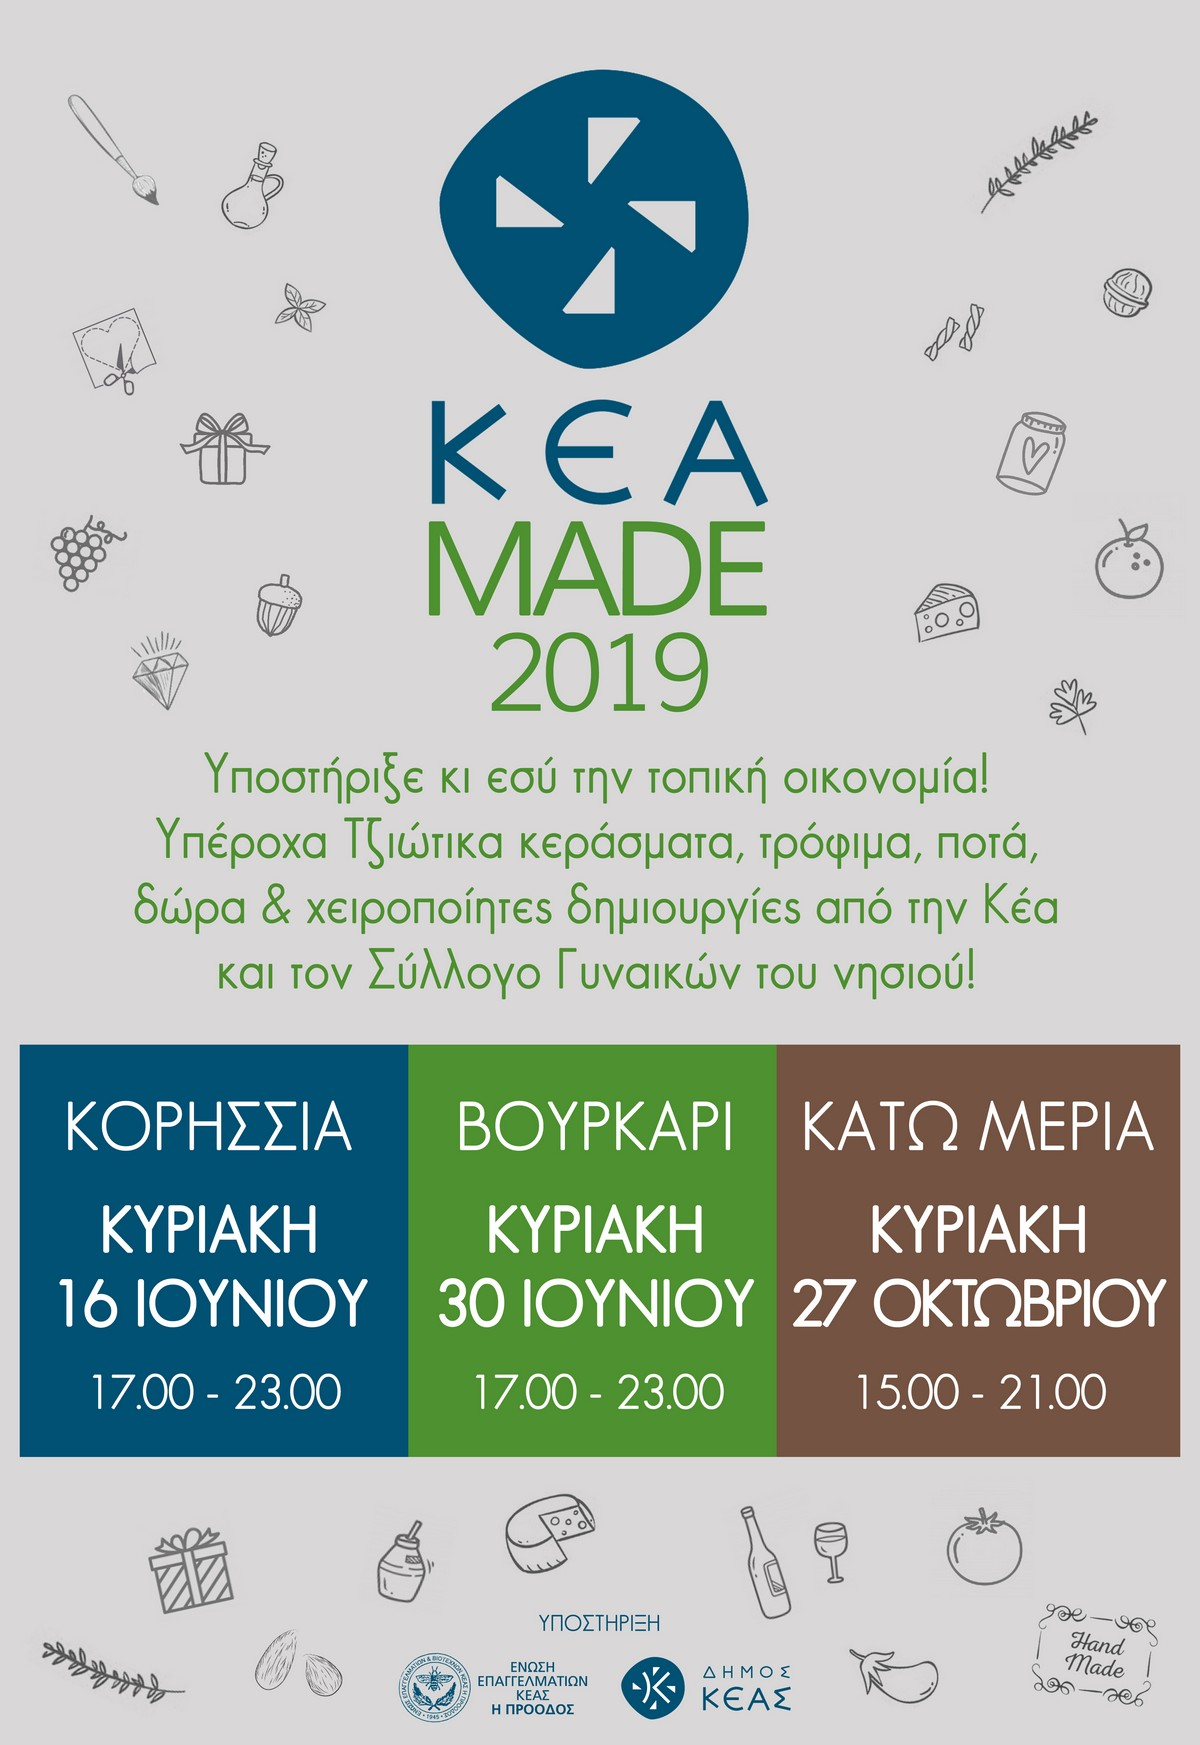 kea made 2019 - 2